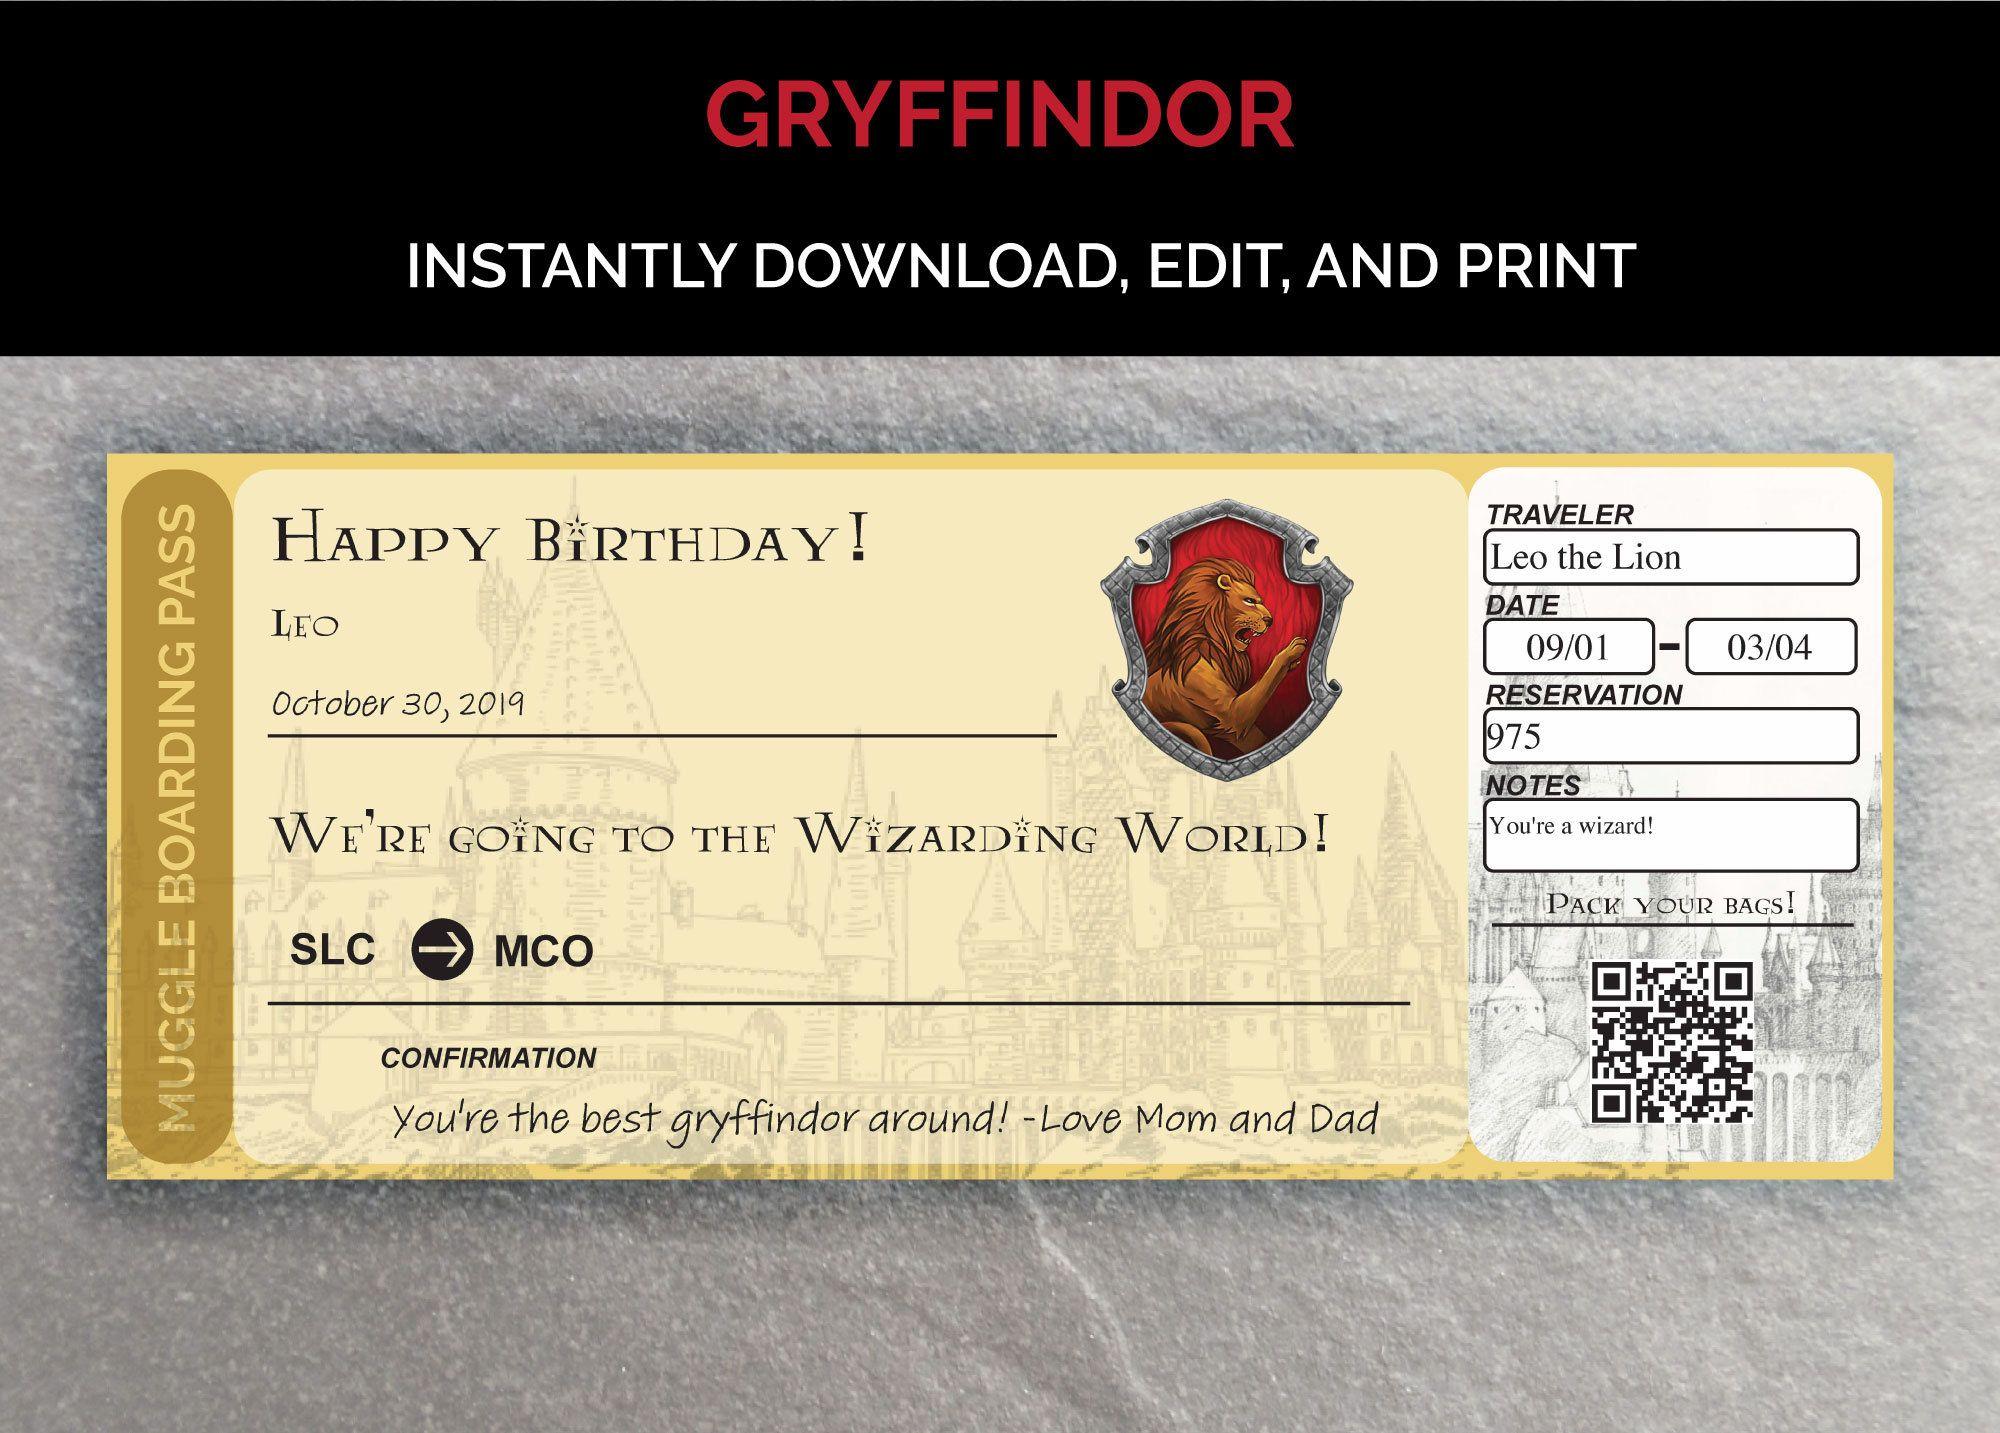 Gryffindor Editable Boarding Pass Template Etsy Boarding Pass Template Wizarding World Of Harry Potter Orlando Planning